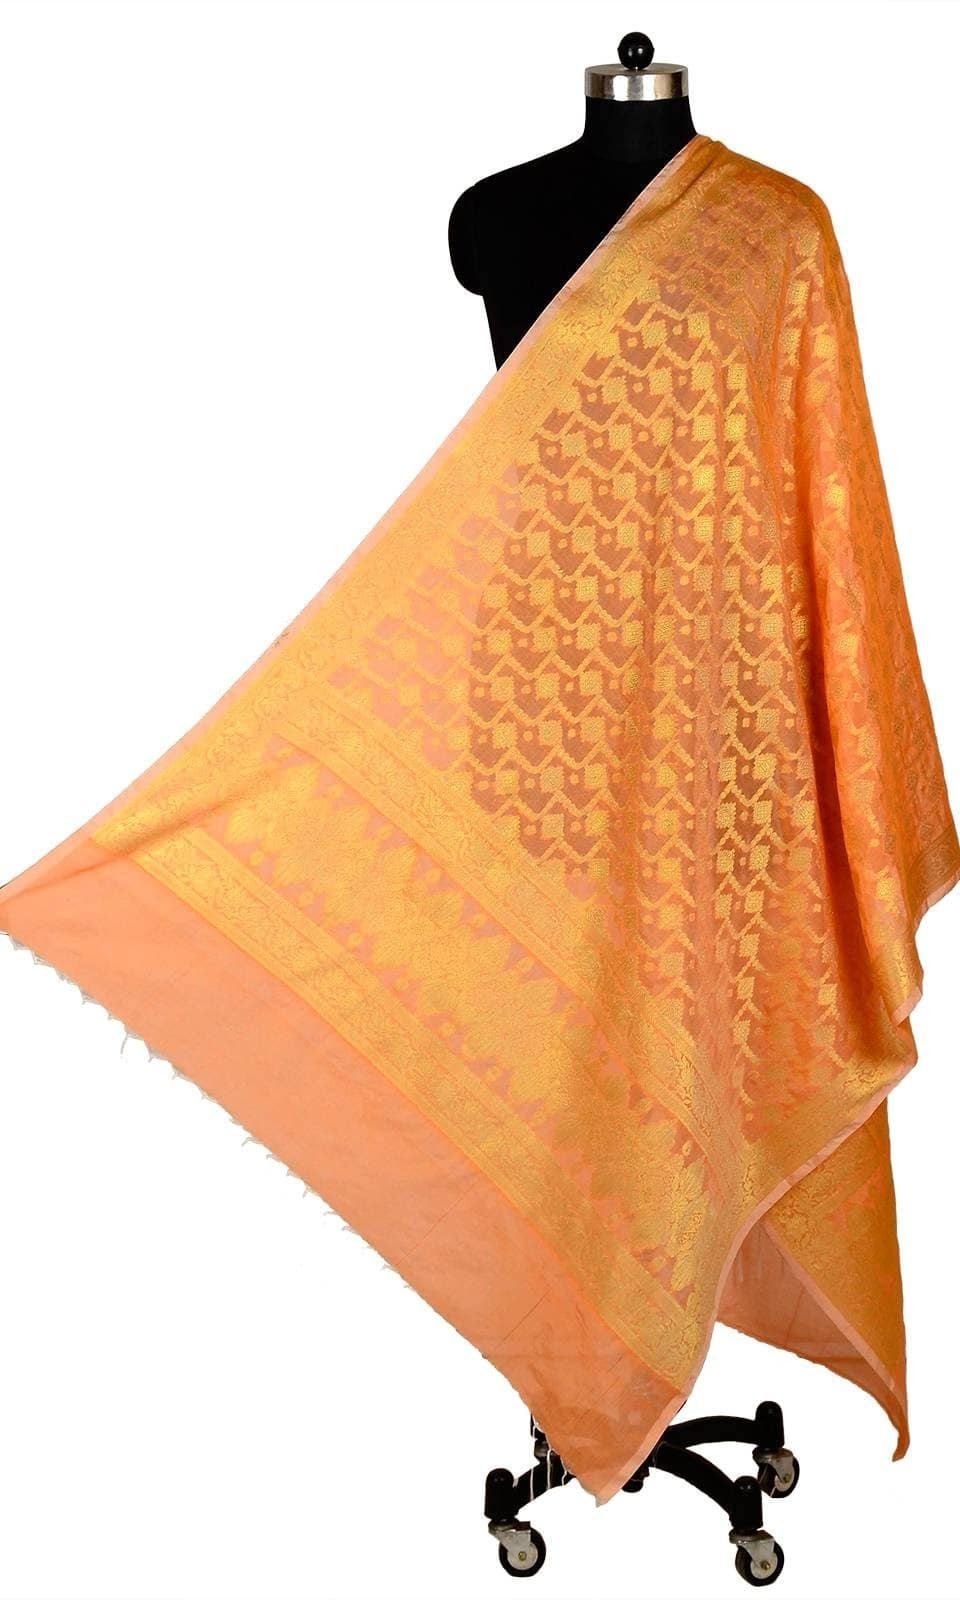 Orange Color Banarasi Silk Dupatta  • Pure Banarasi Silk Dupatta • Fabric : Banarasi Silk • Dupatta Size : 100 inches X 36 inches  SKU: DUP0074-Orange Rs. 999.00  #IndependenceDay